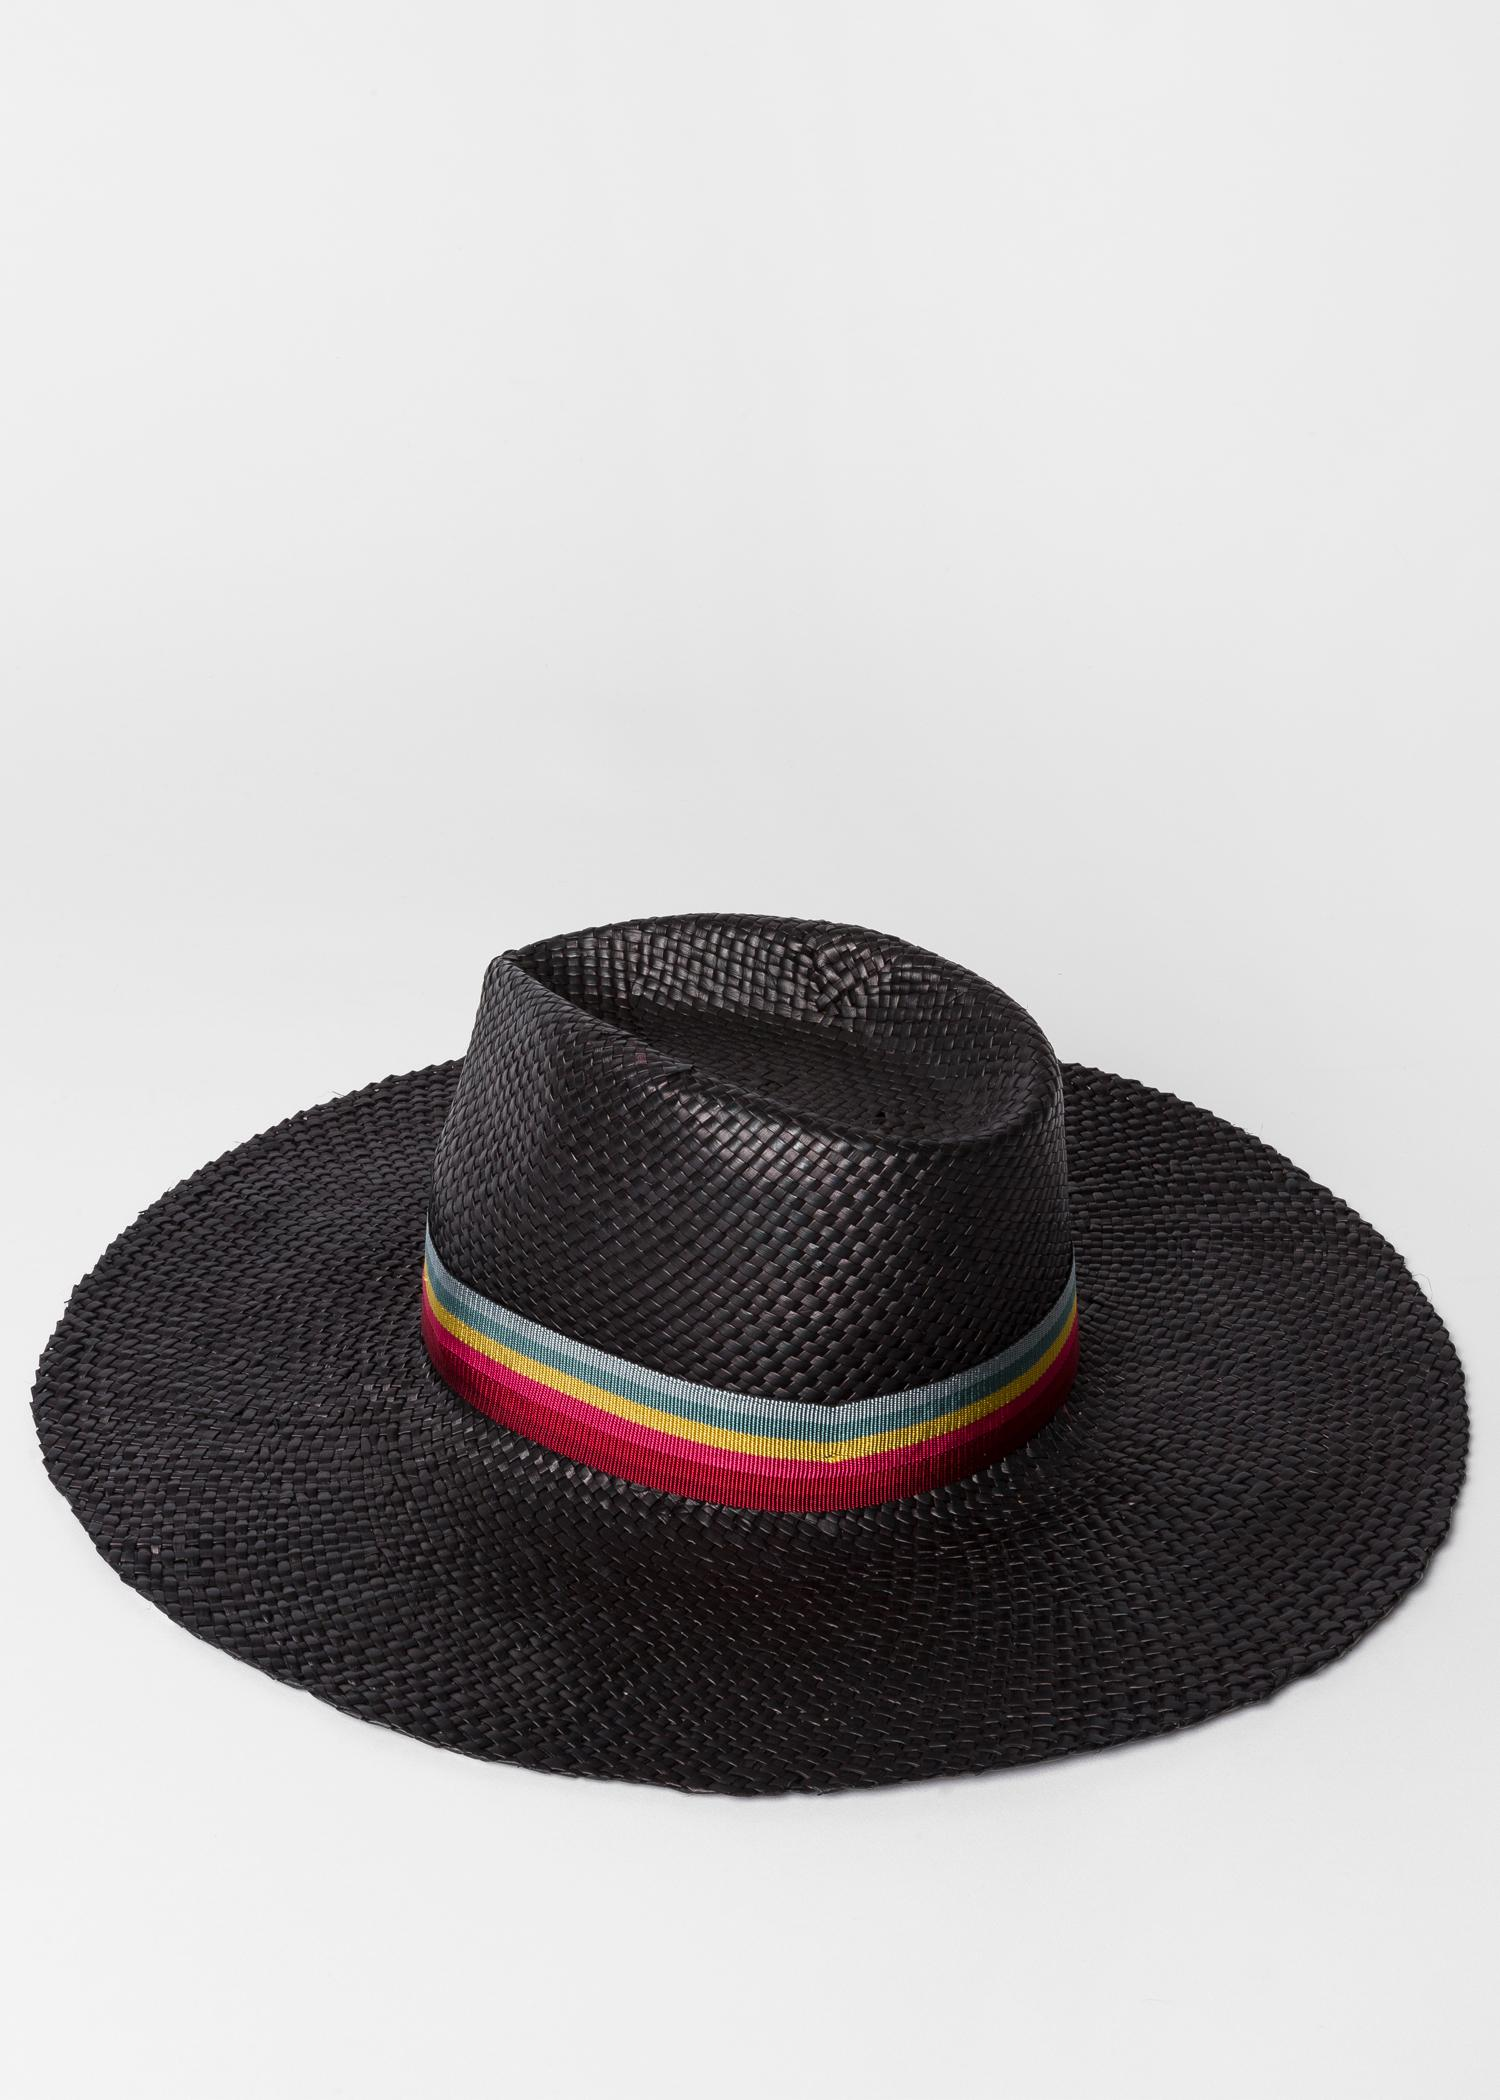 39f42d45 Paul Smith - Black Woven Fedora Hat With 'swirl-stripe' Band - Lyst. View  fullscreen